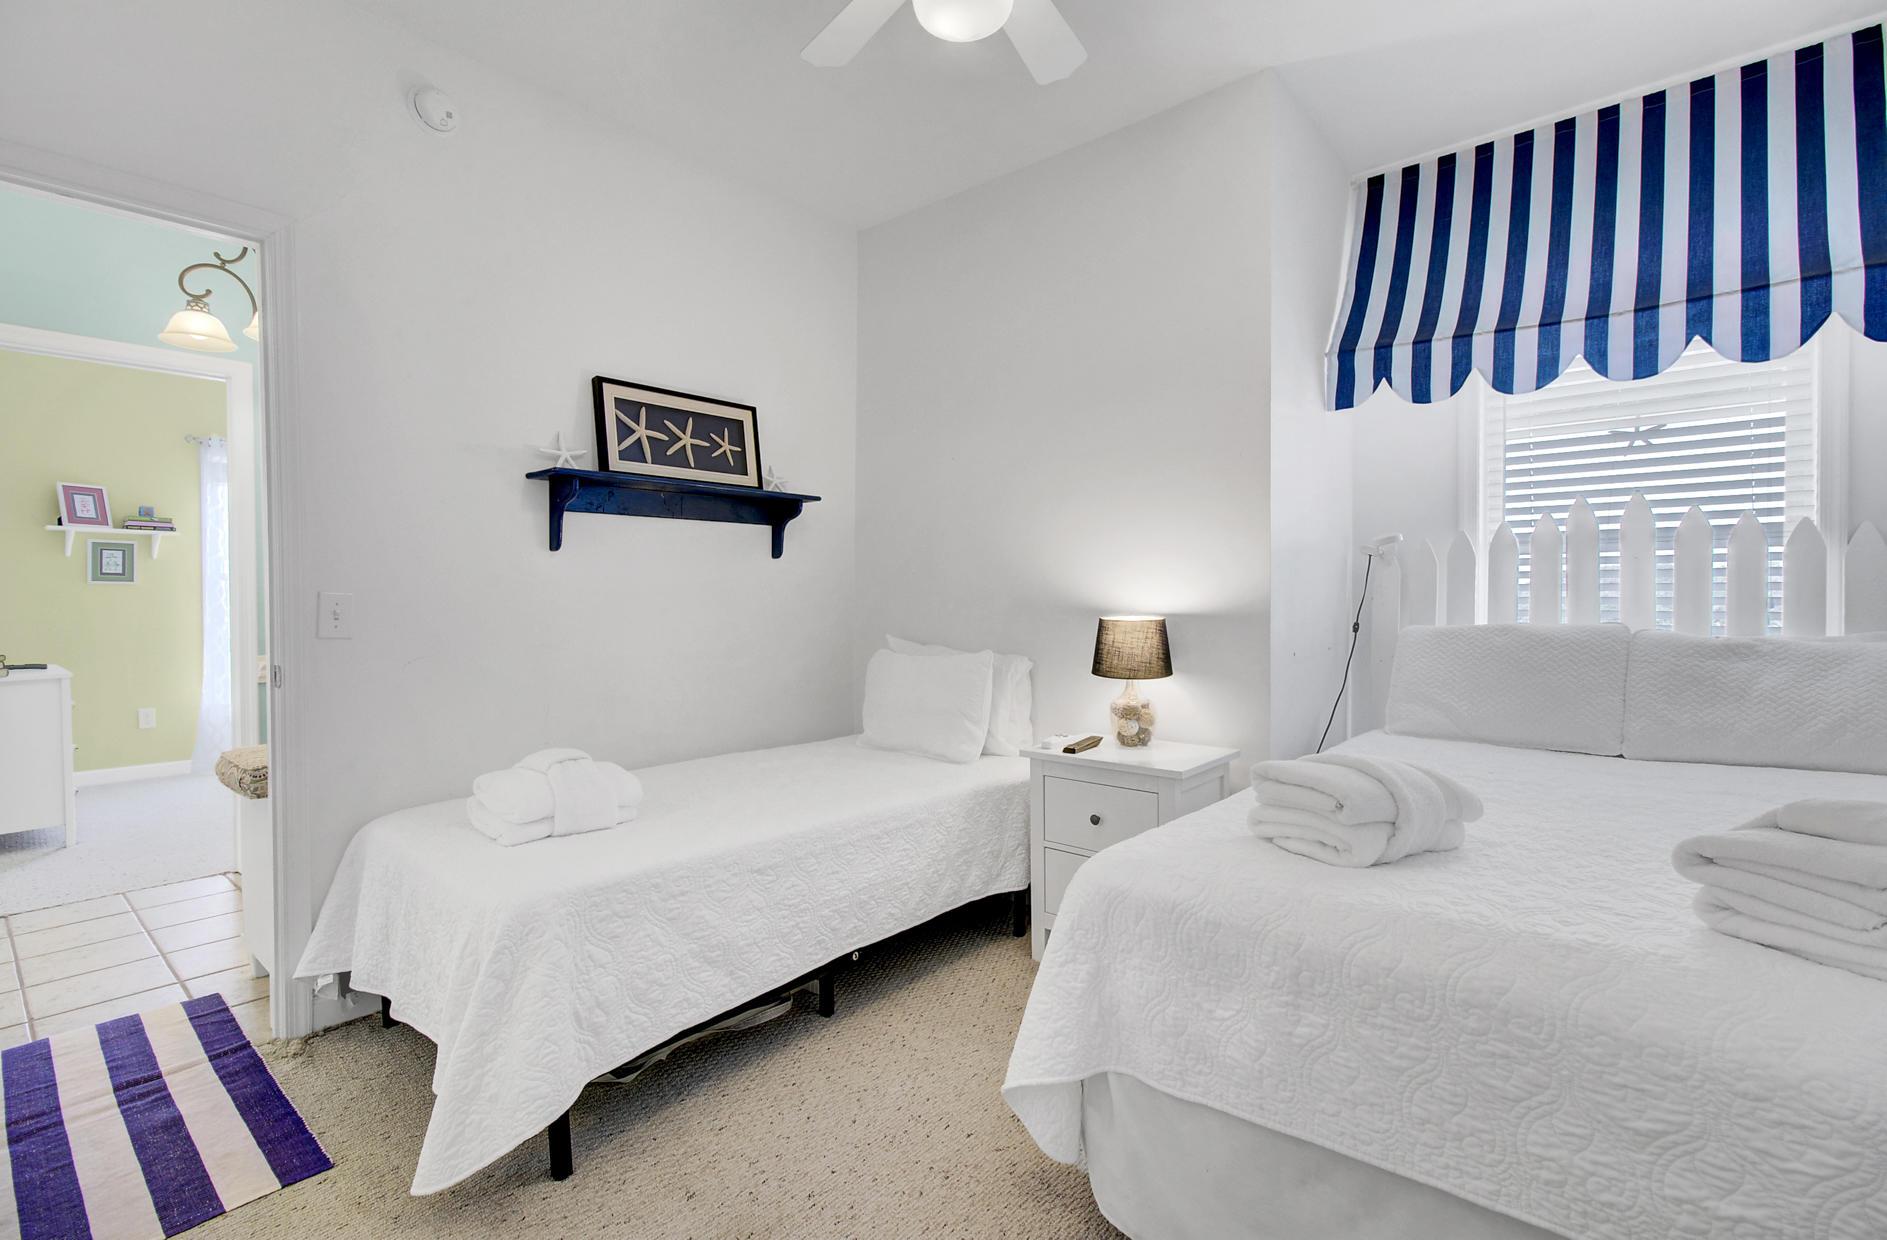 Seaside Villas I Homes For Sale - 111 Arctic, Folly Beach, SC - 18